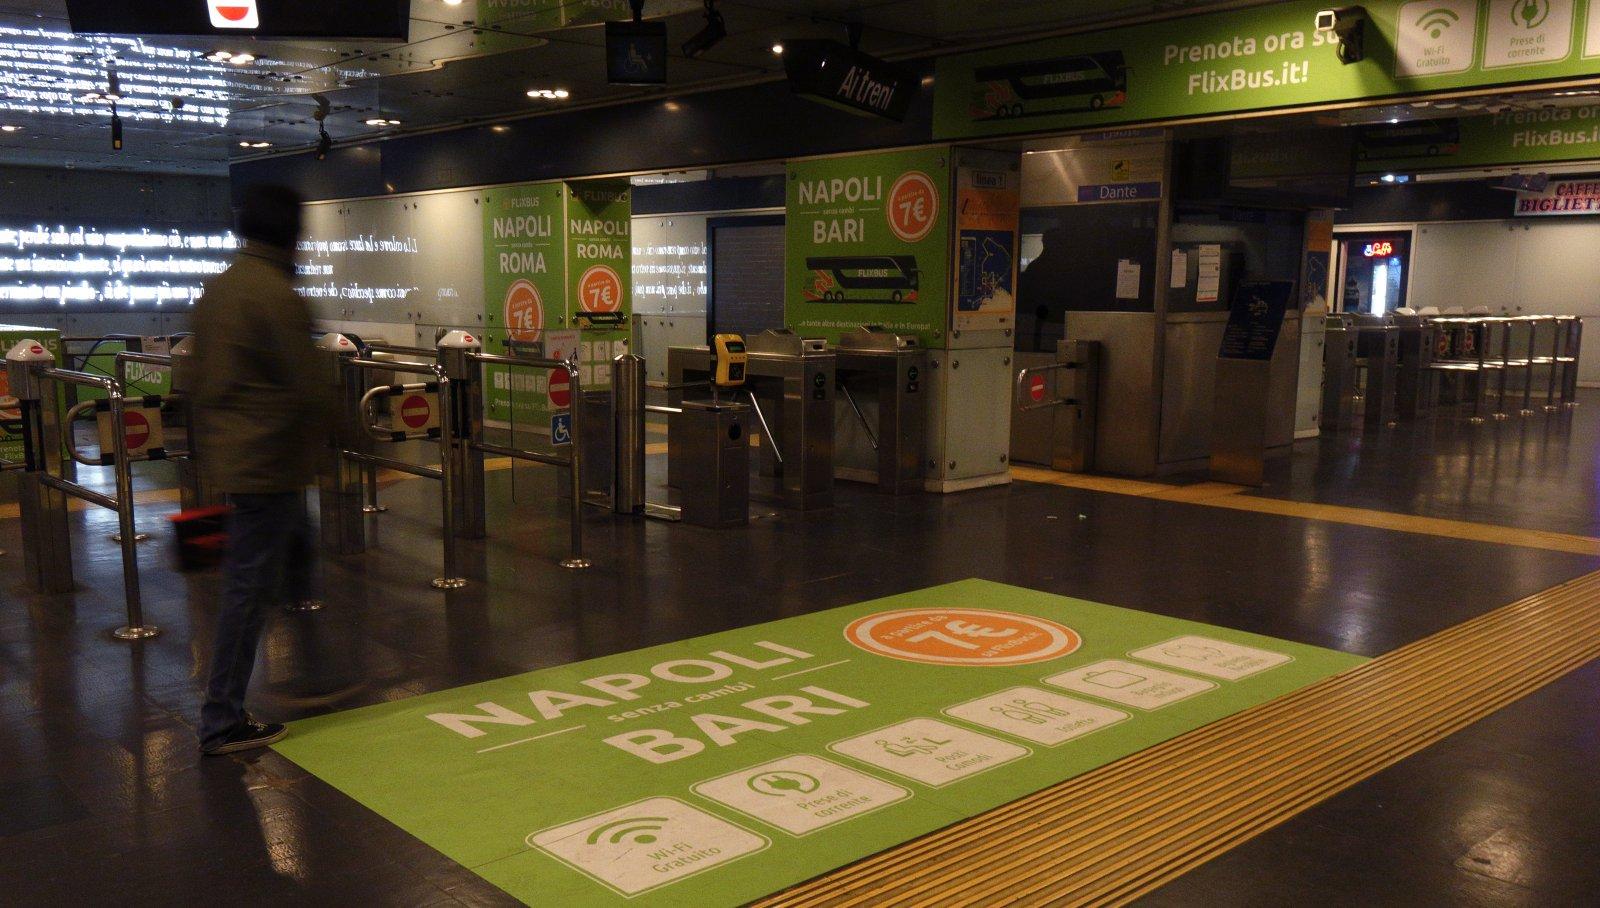 Metro Napoli Station Domination Flixbus @igpdecaux